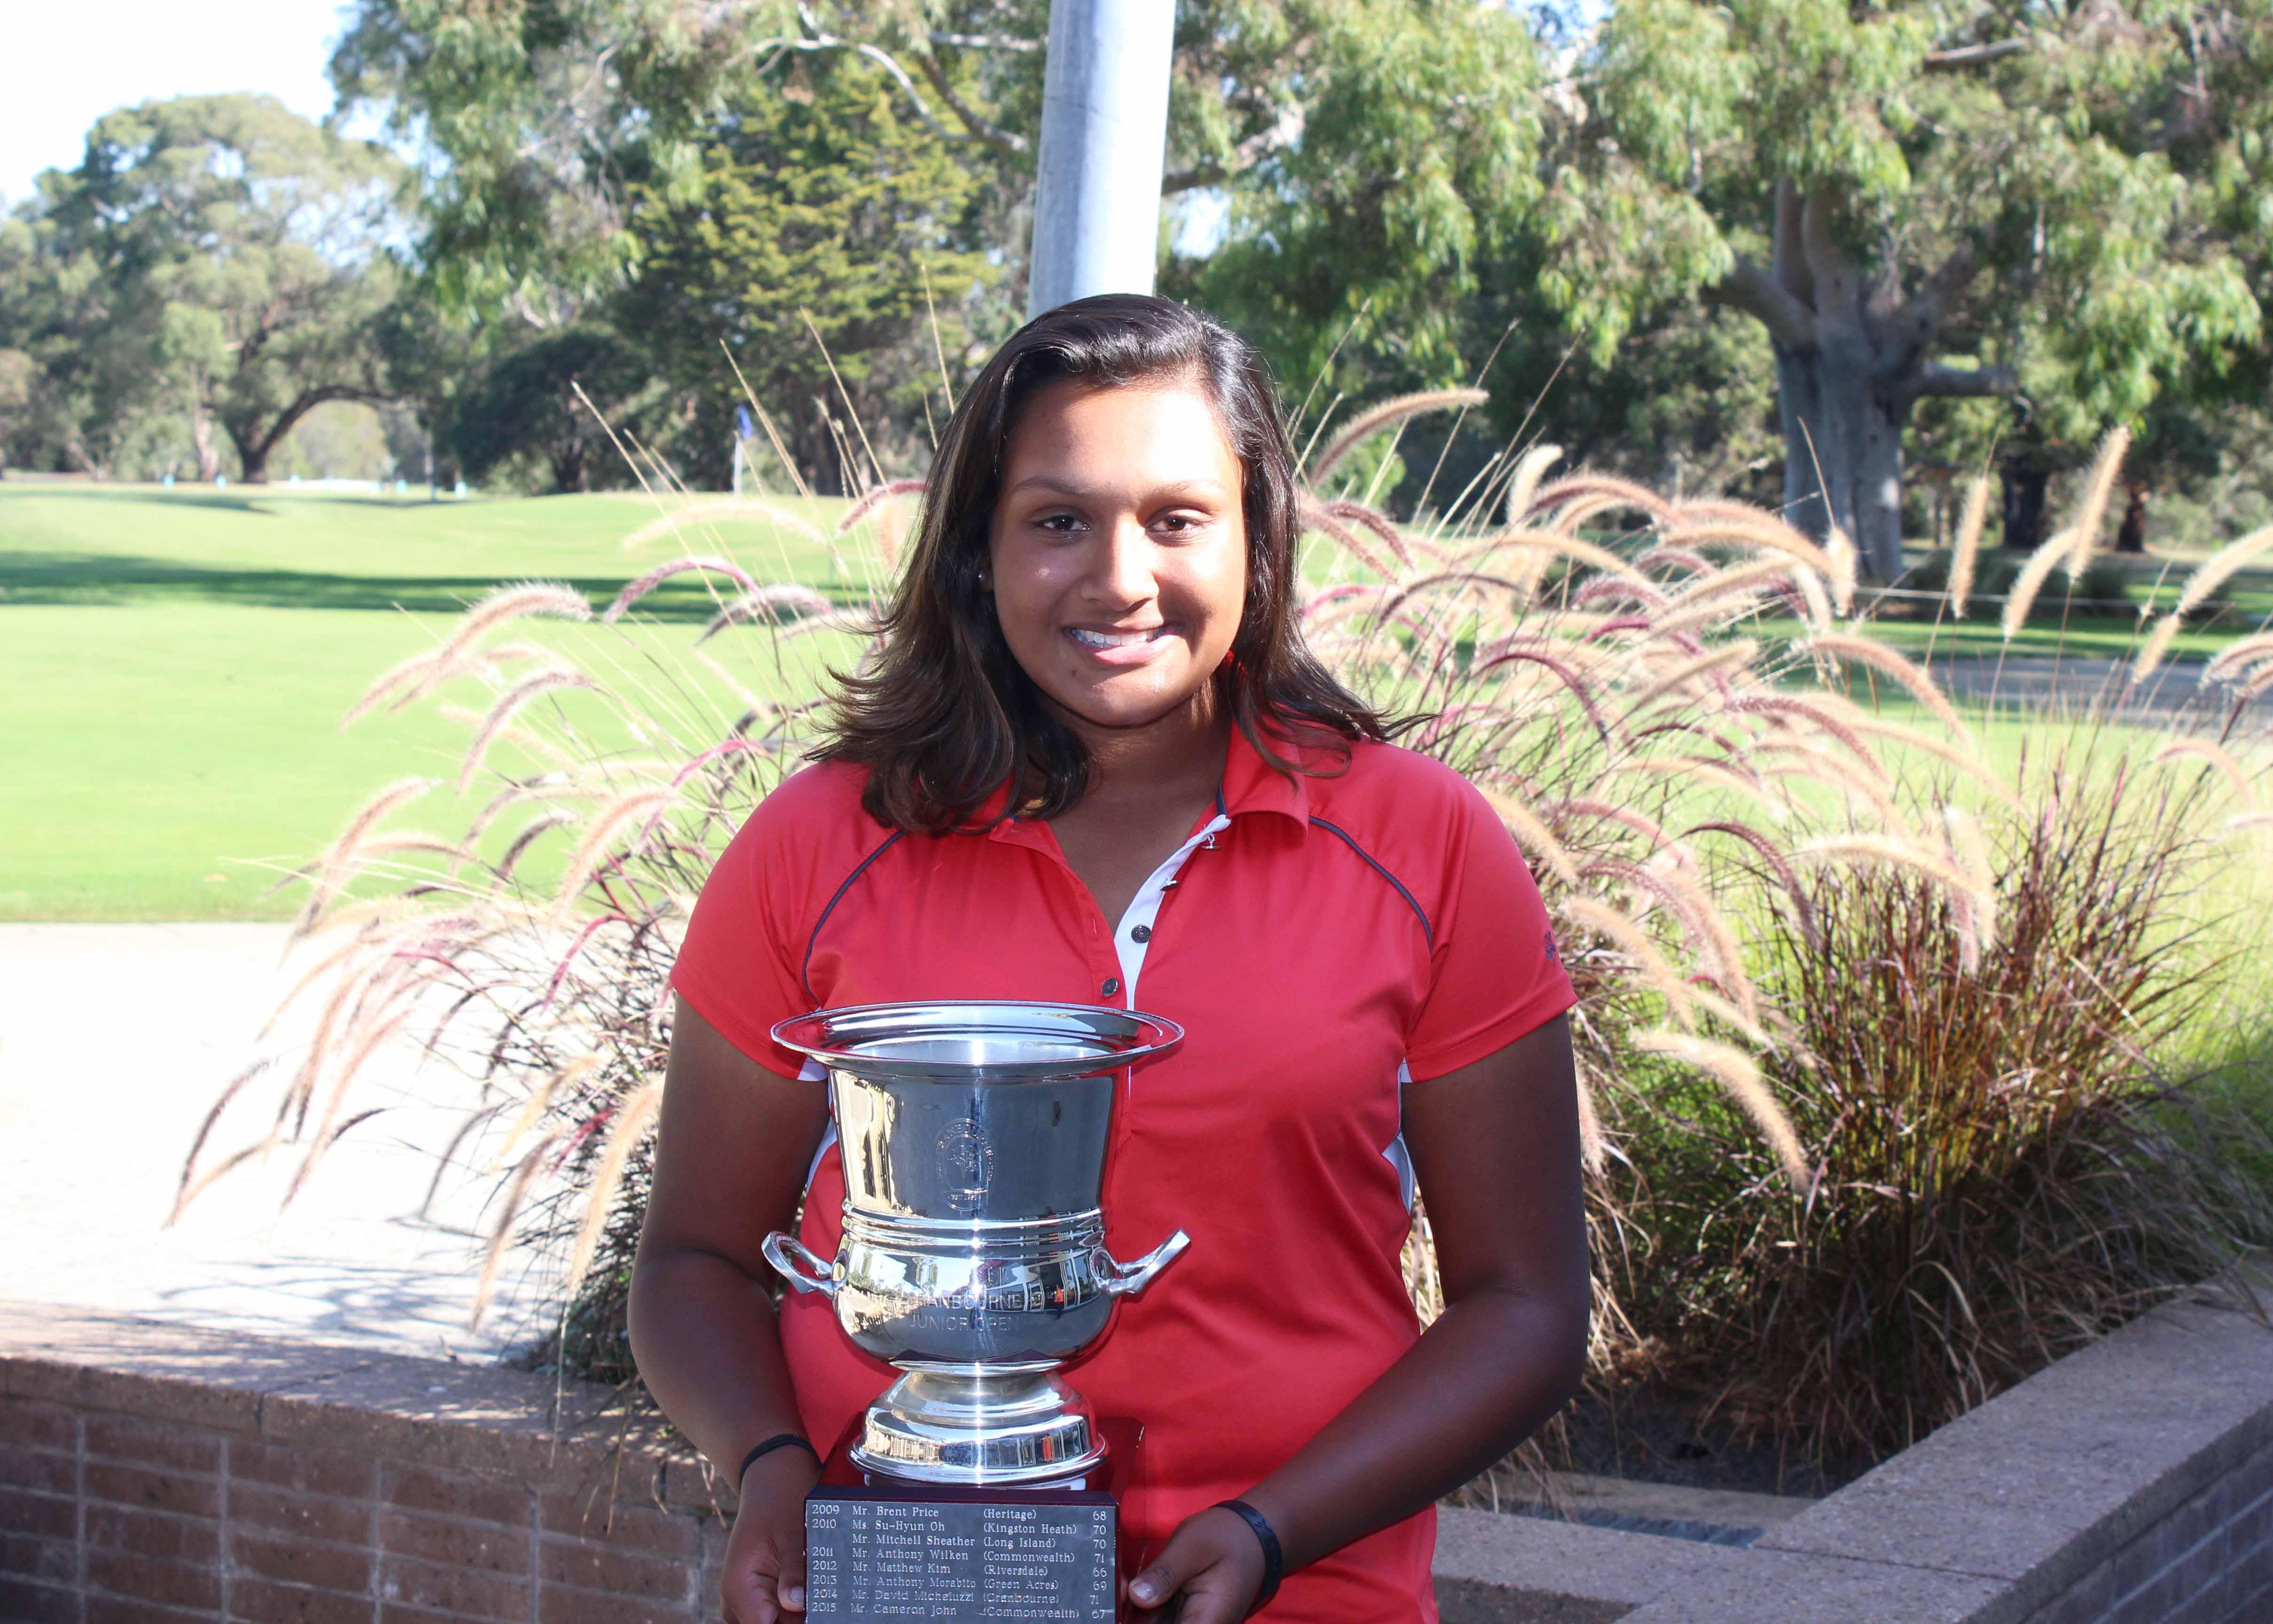 Junior Open Winner 2016 Shanaiah Fernandez